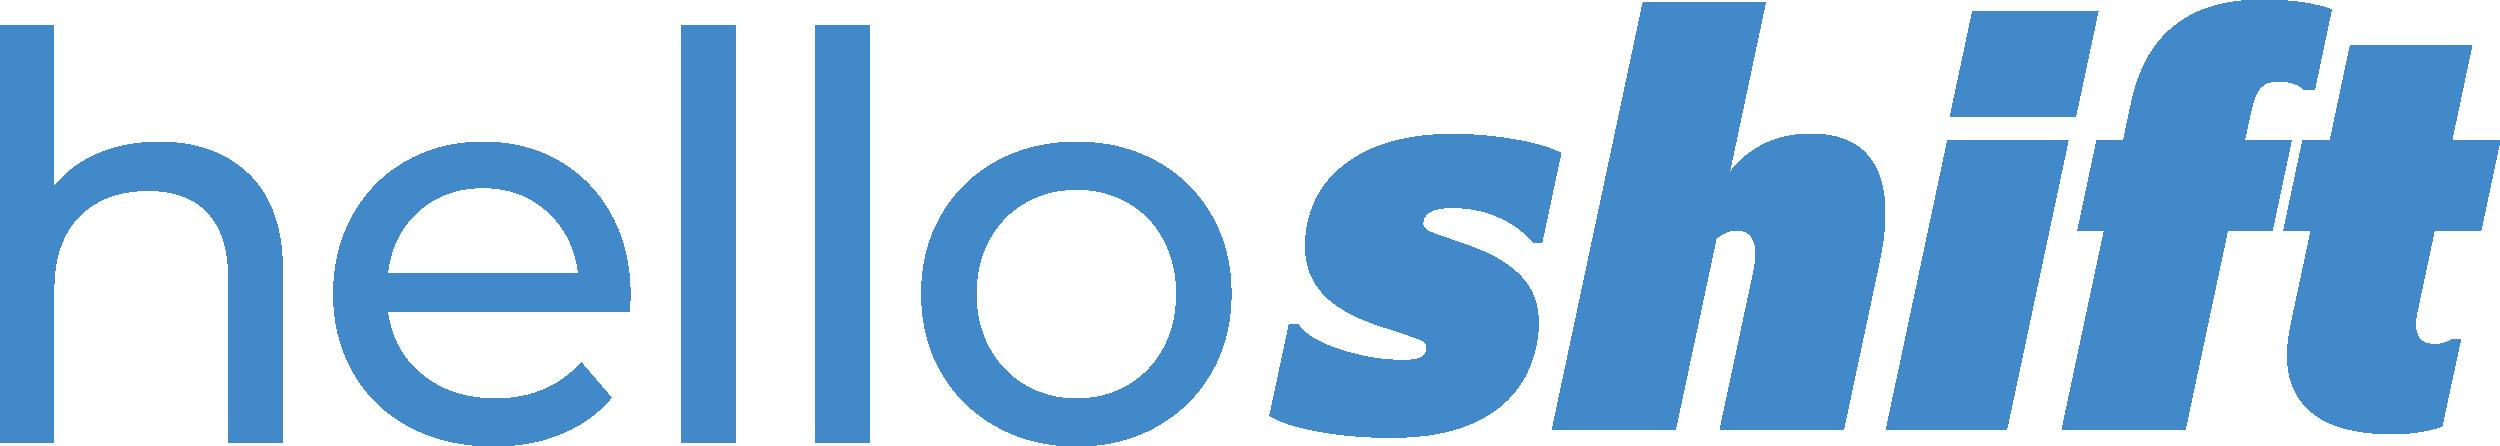 HelloShift logo